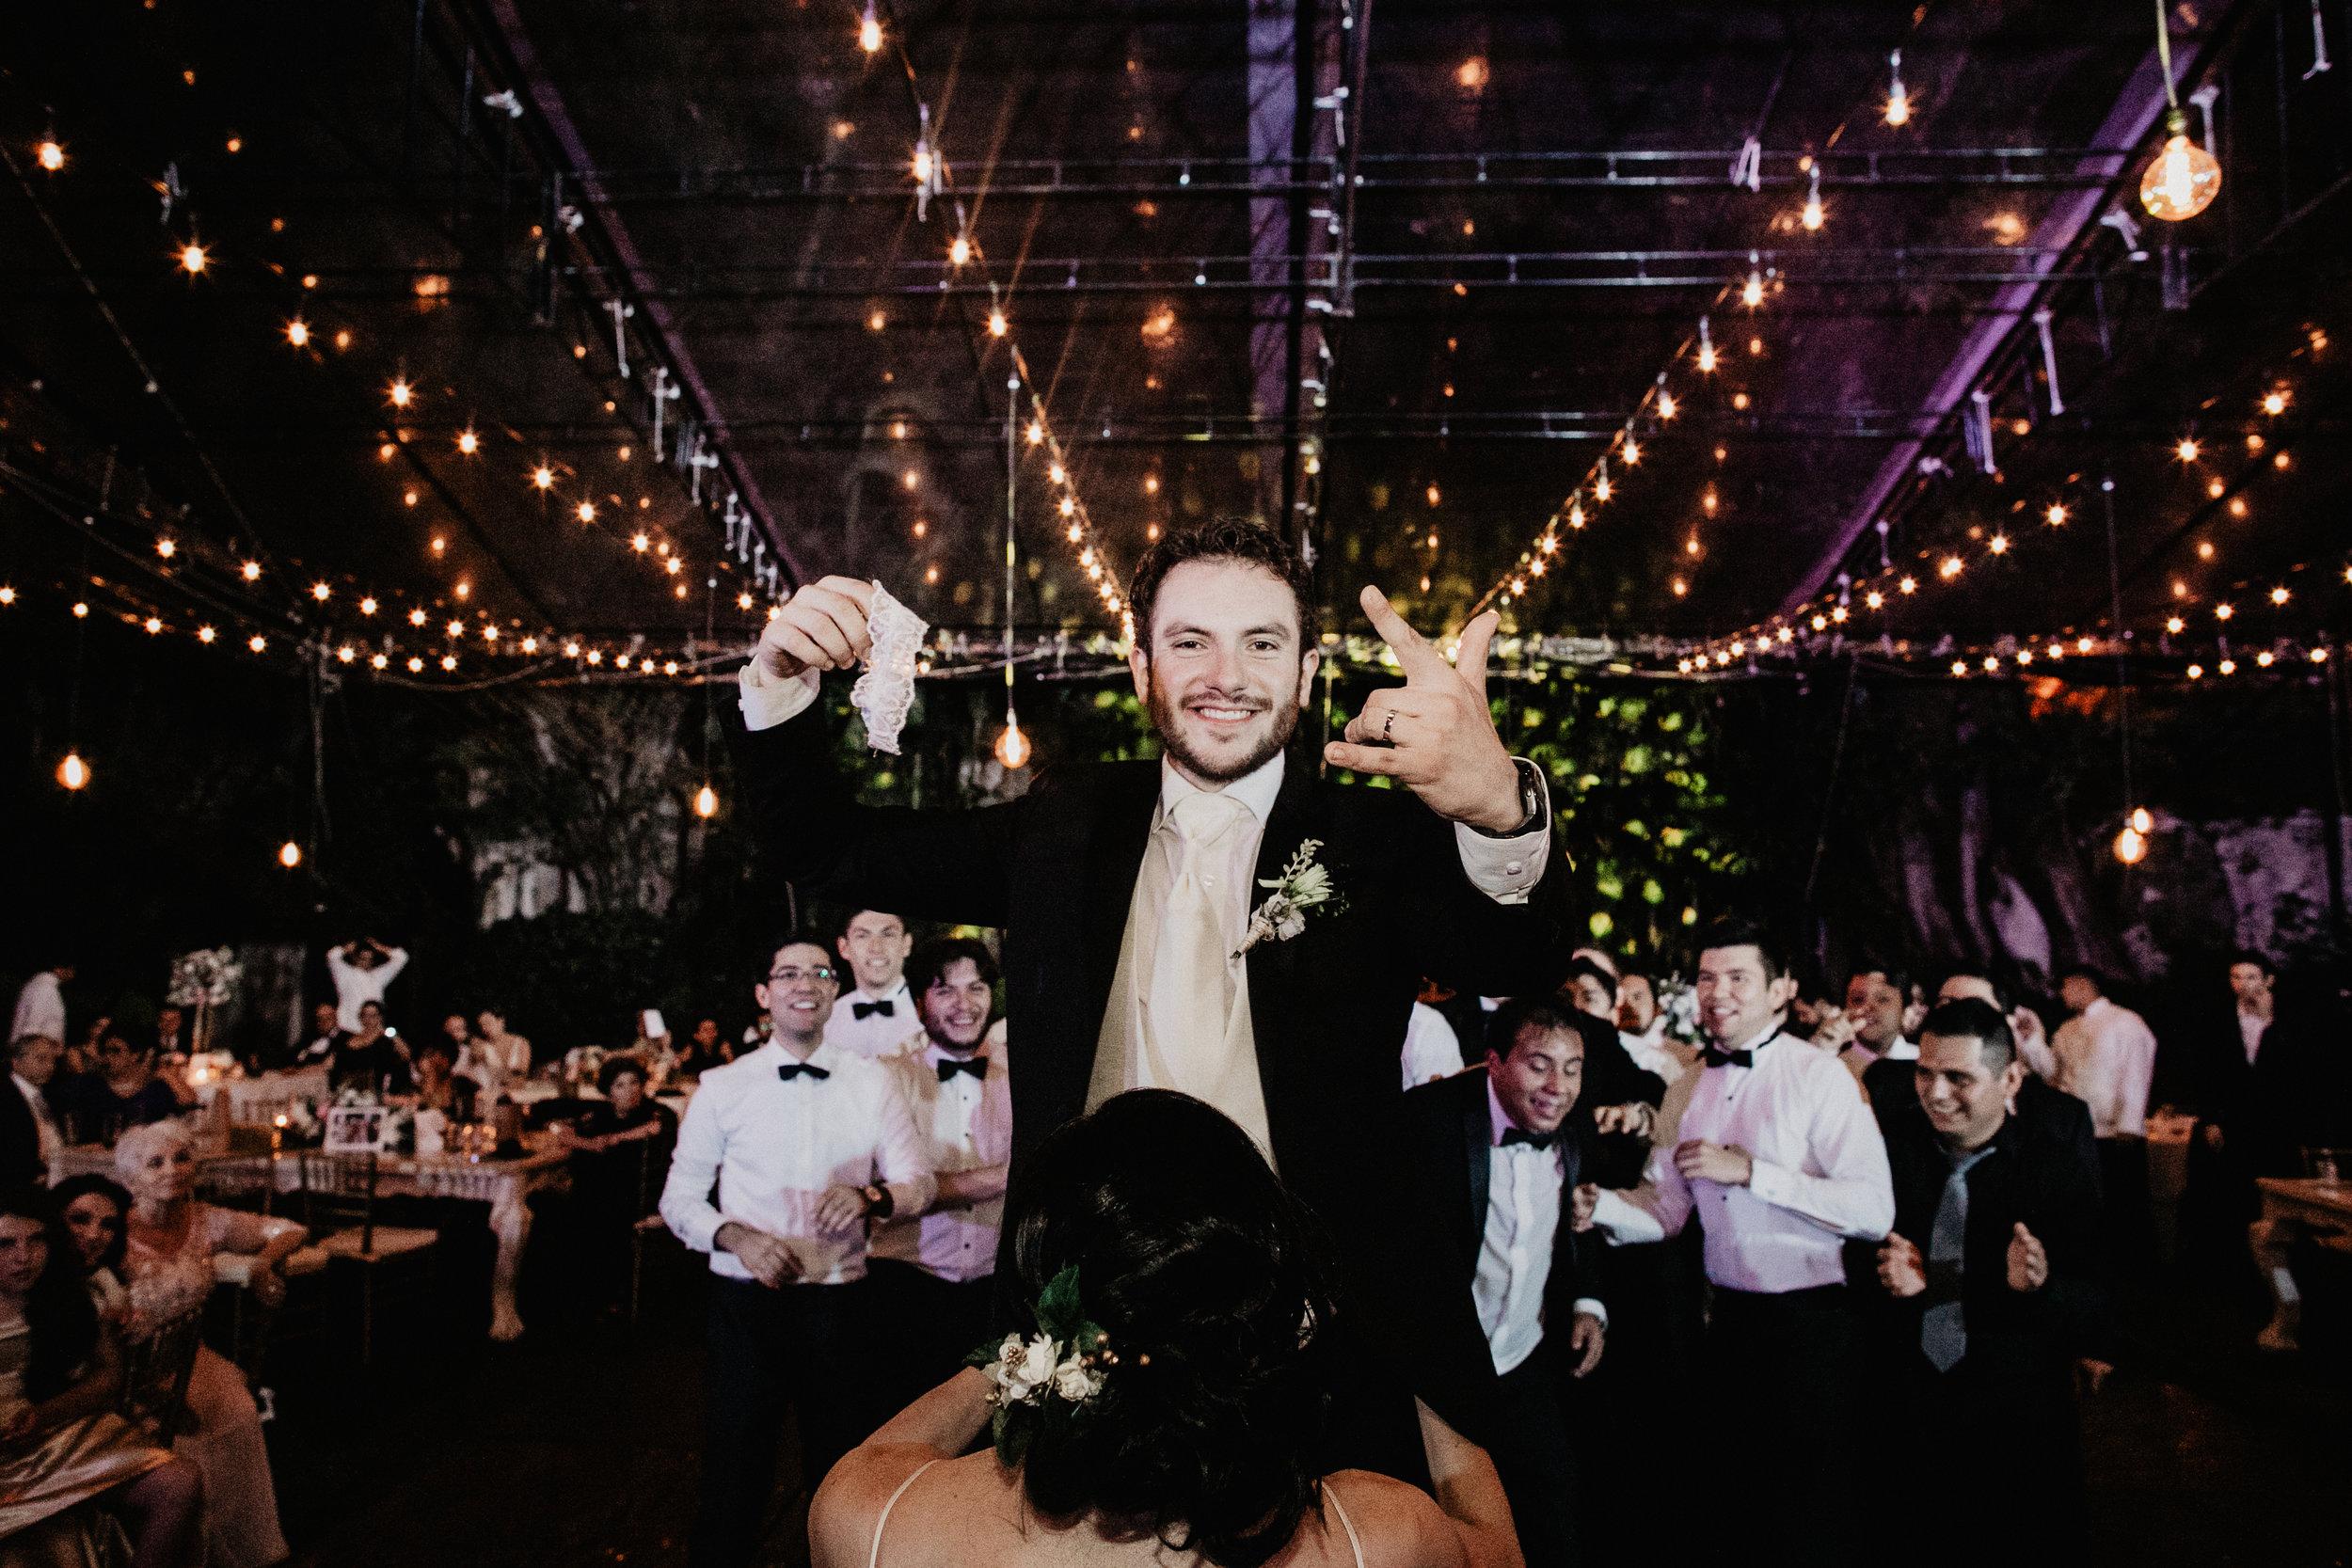 Alfonso_flores_destination_wedding_photography_vanesa_carlos-1248.JPG